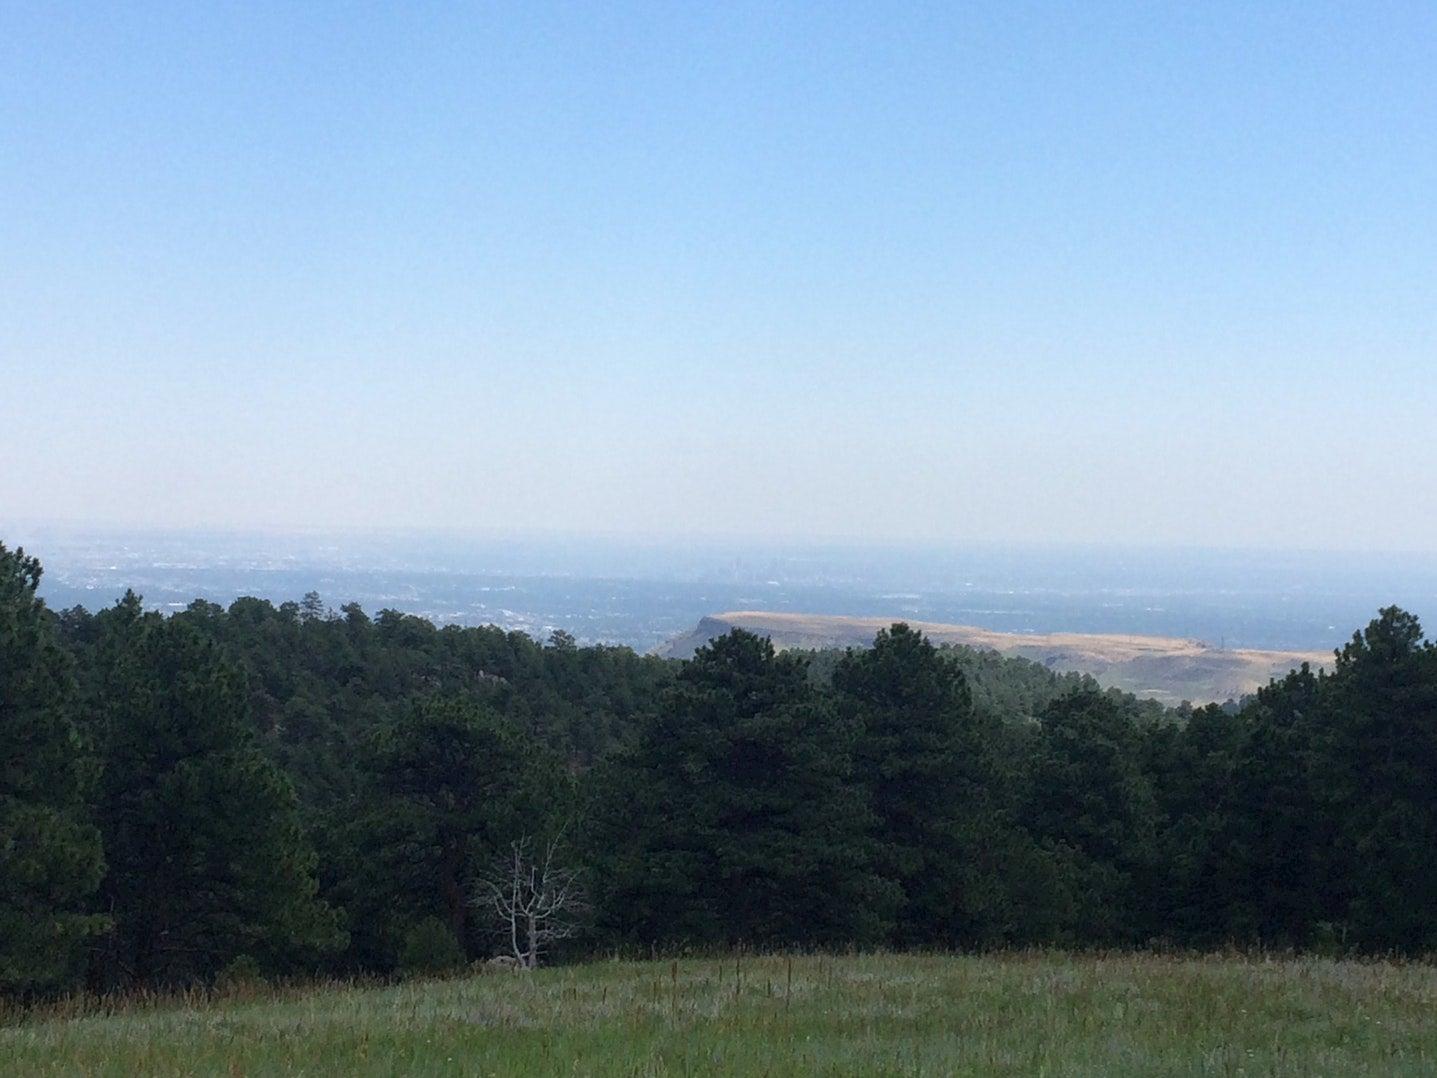 View overlooking valley below from mountainside campsite.